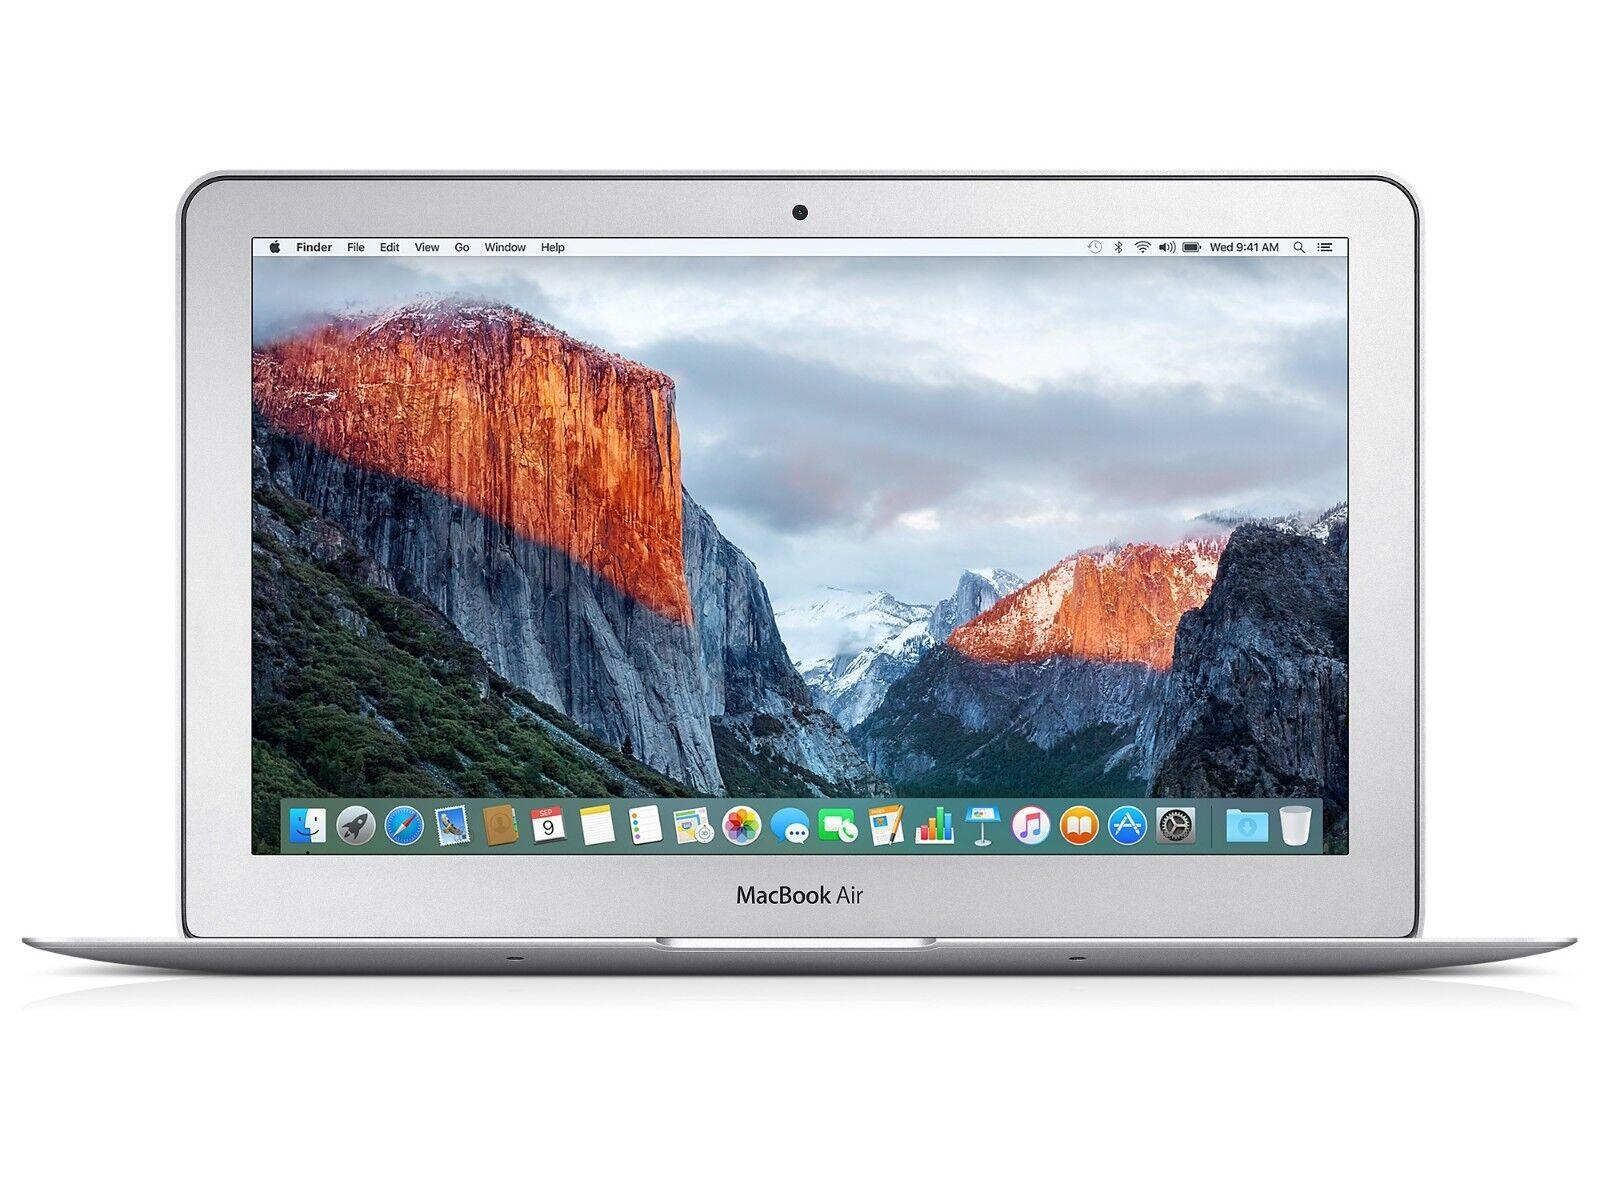 "Apple MacBook Air 11.6"" LED Laptop 1.6GHz Intel i5 4GB 128GB SSD MJVM2LLA 2015"